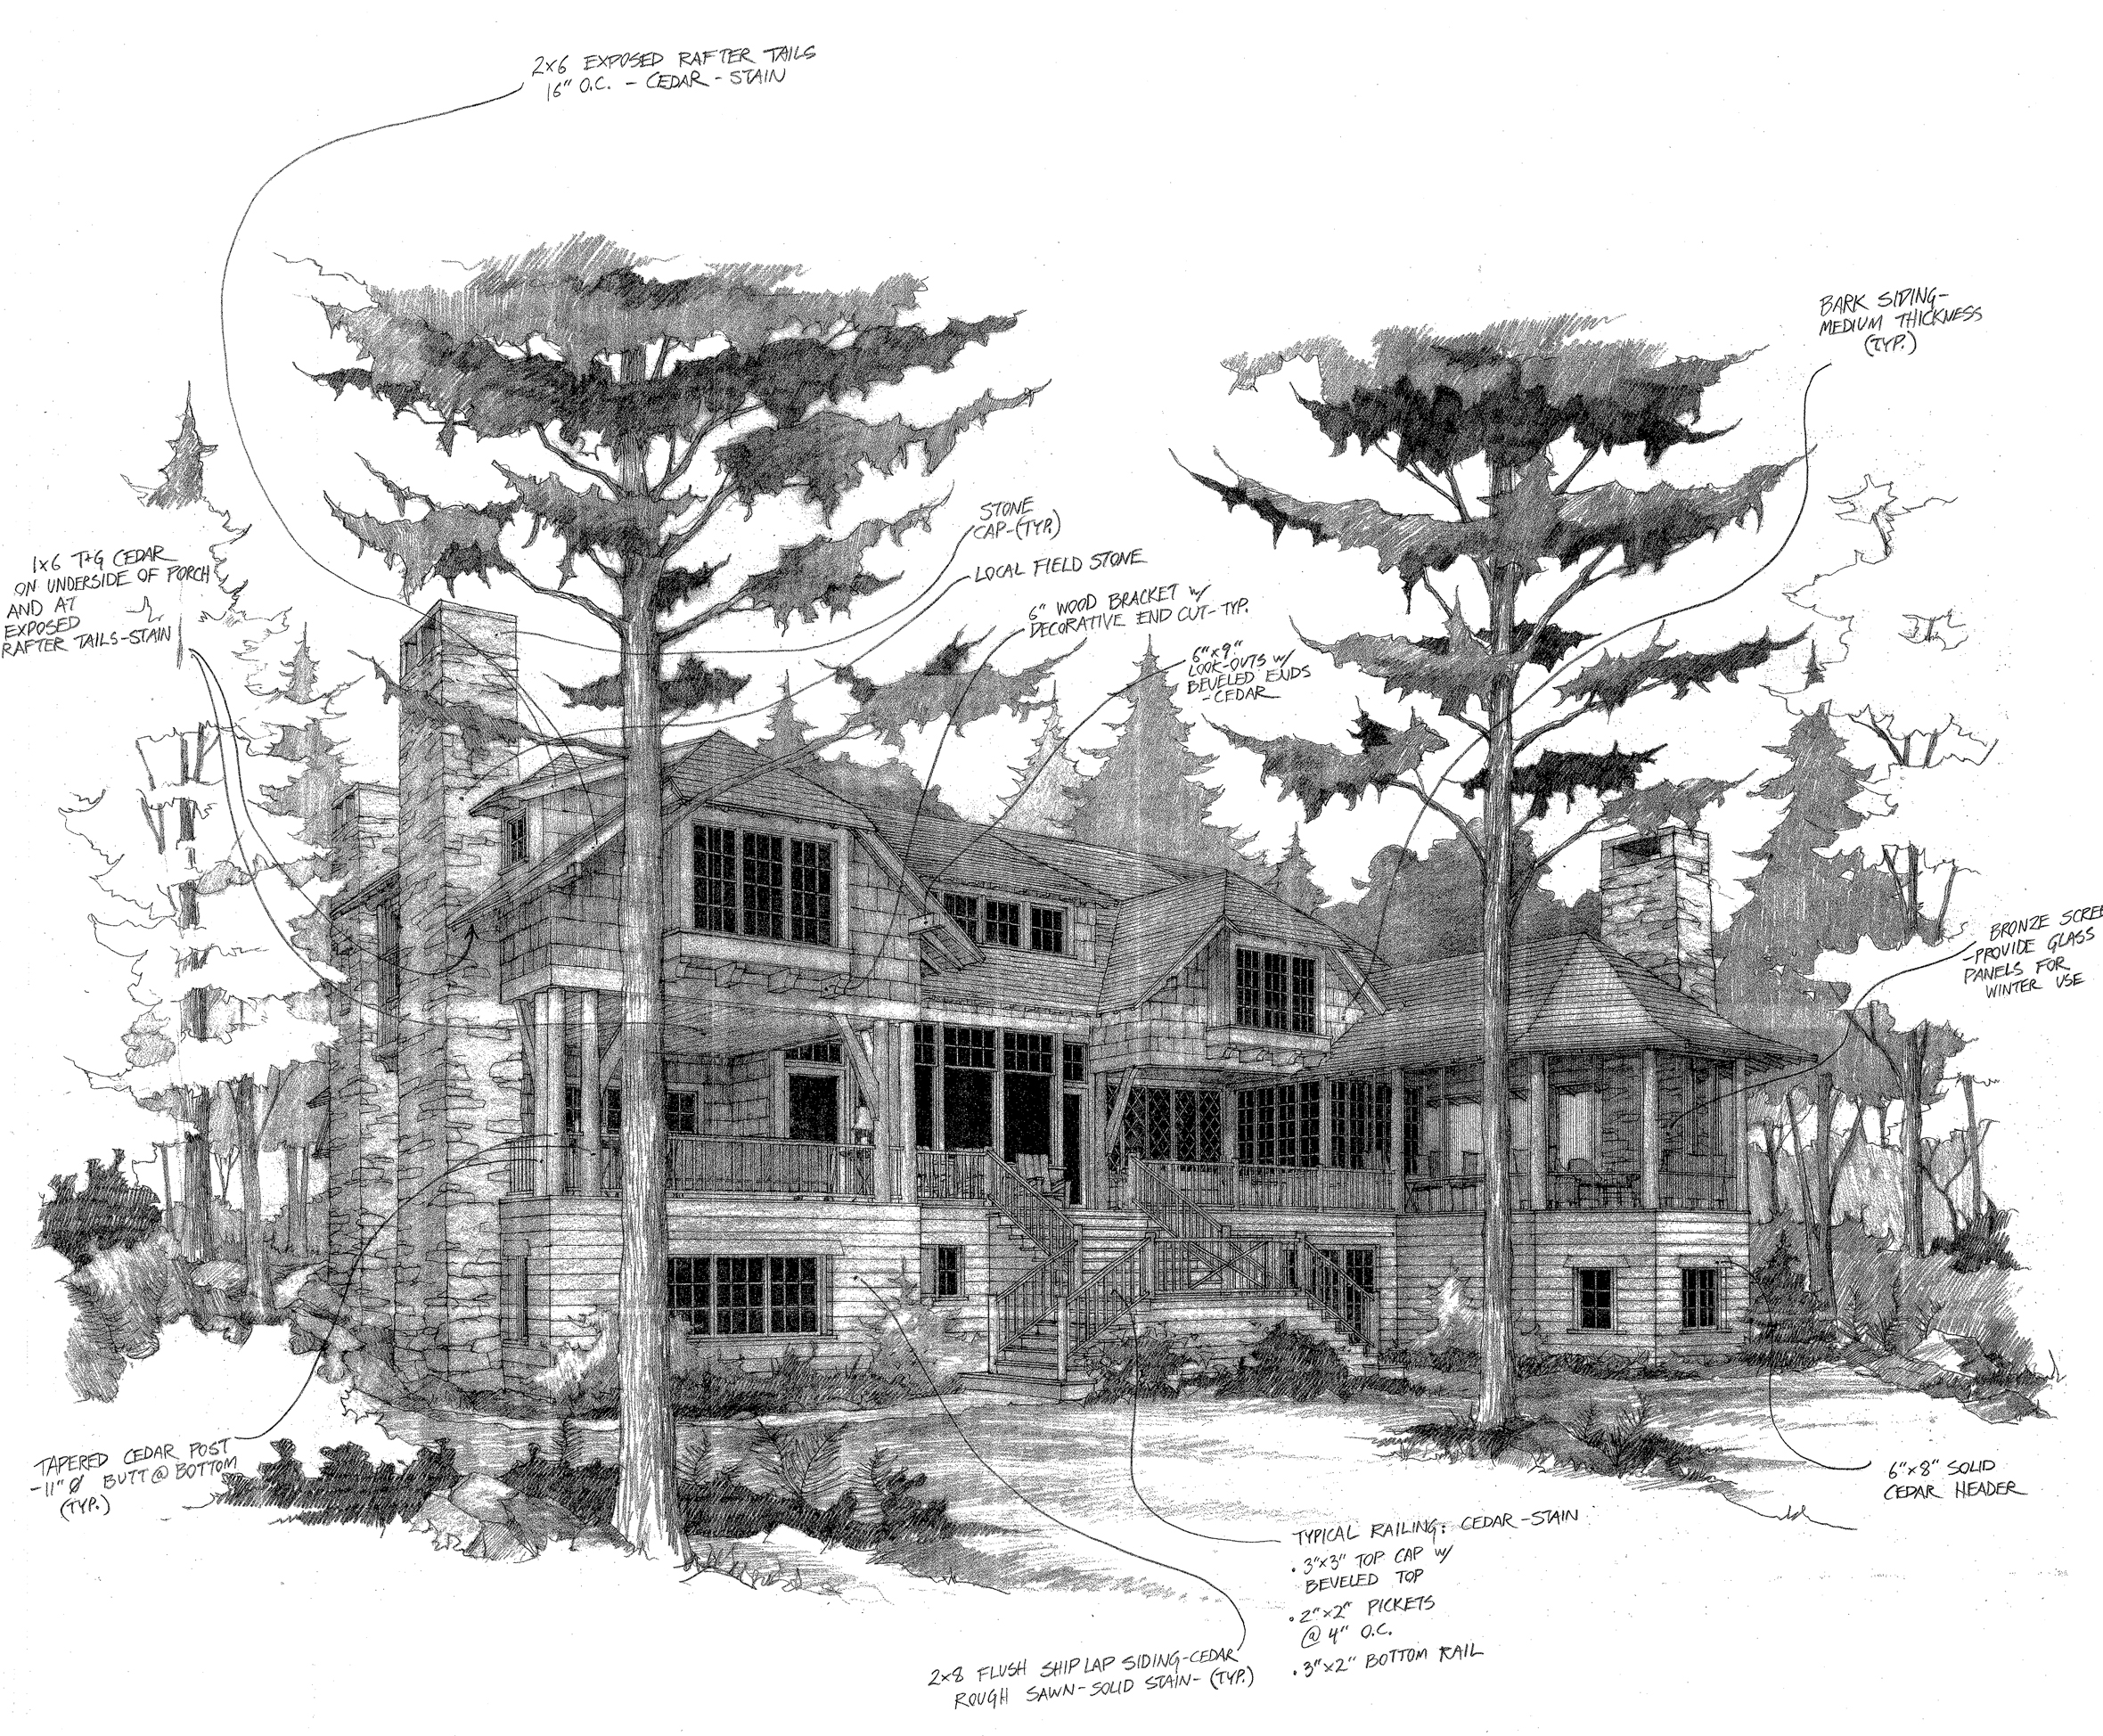 Lake_Placid.New_York.Lake_House.Robert_Orr_&_Associates.Architecture.Landscape_Architecture.Urbanism.Camp.Lake_Side_Perspective.Mark_Kline_Del.Pursley_Dixon.jpg